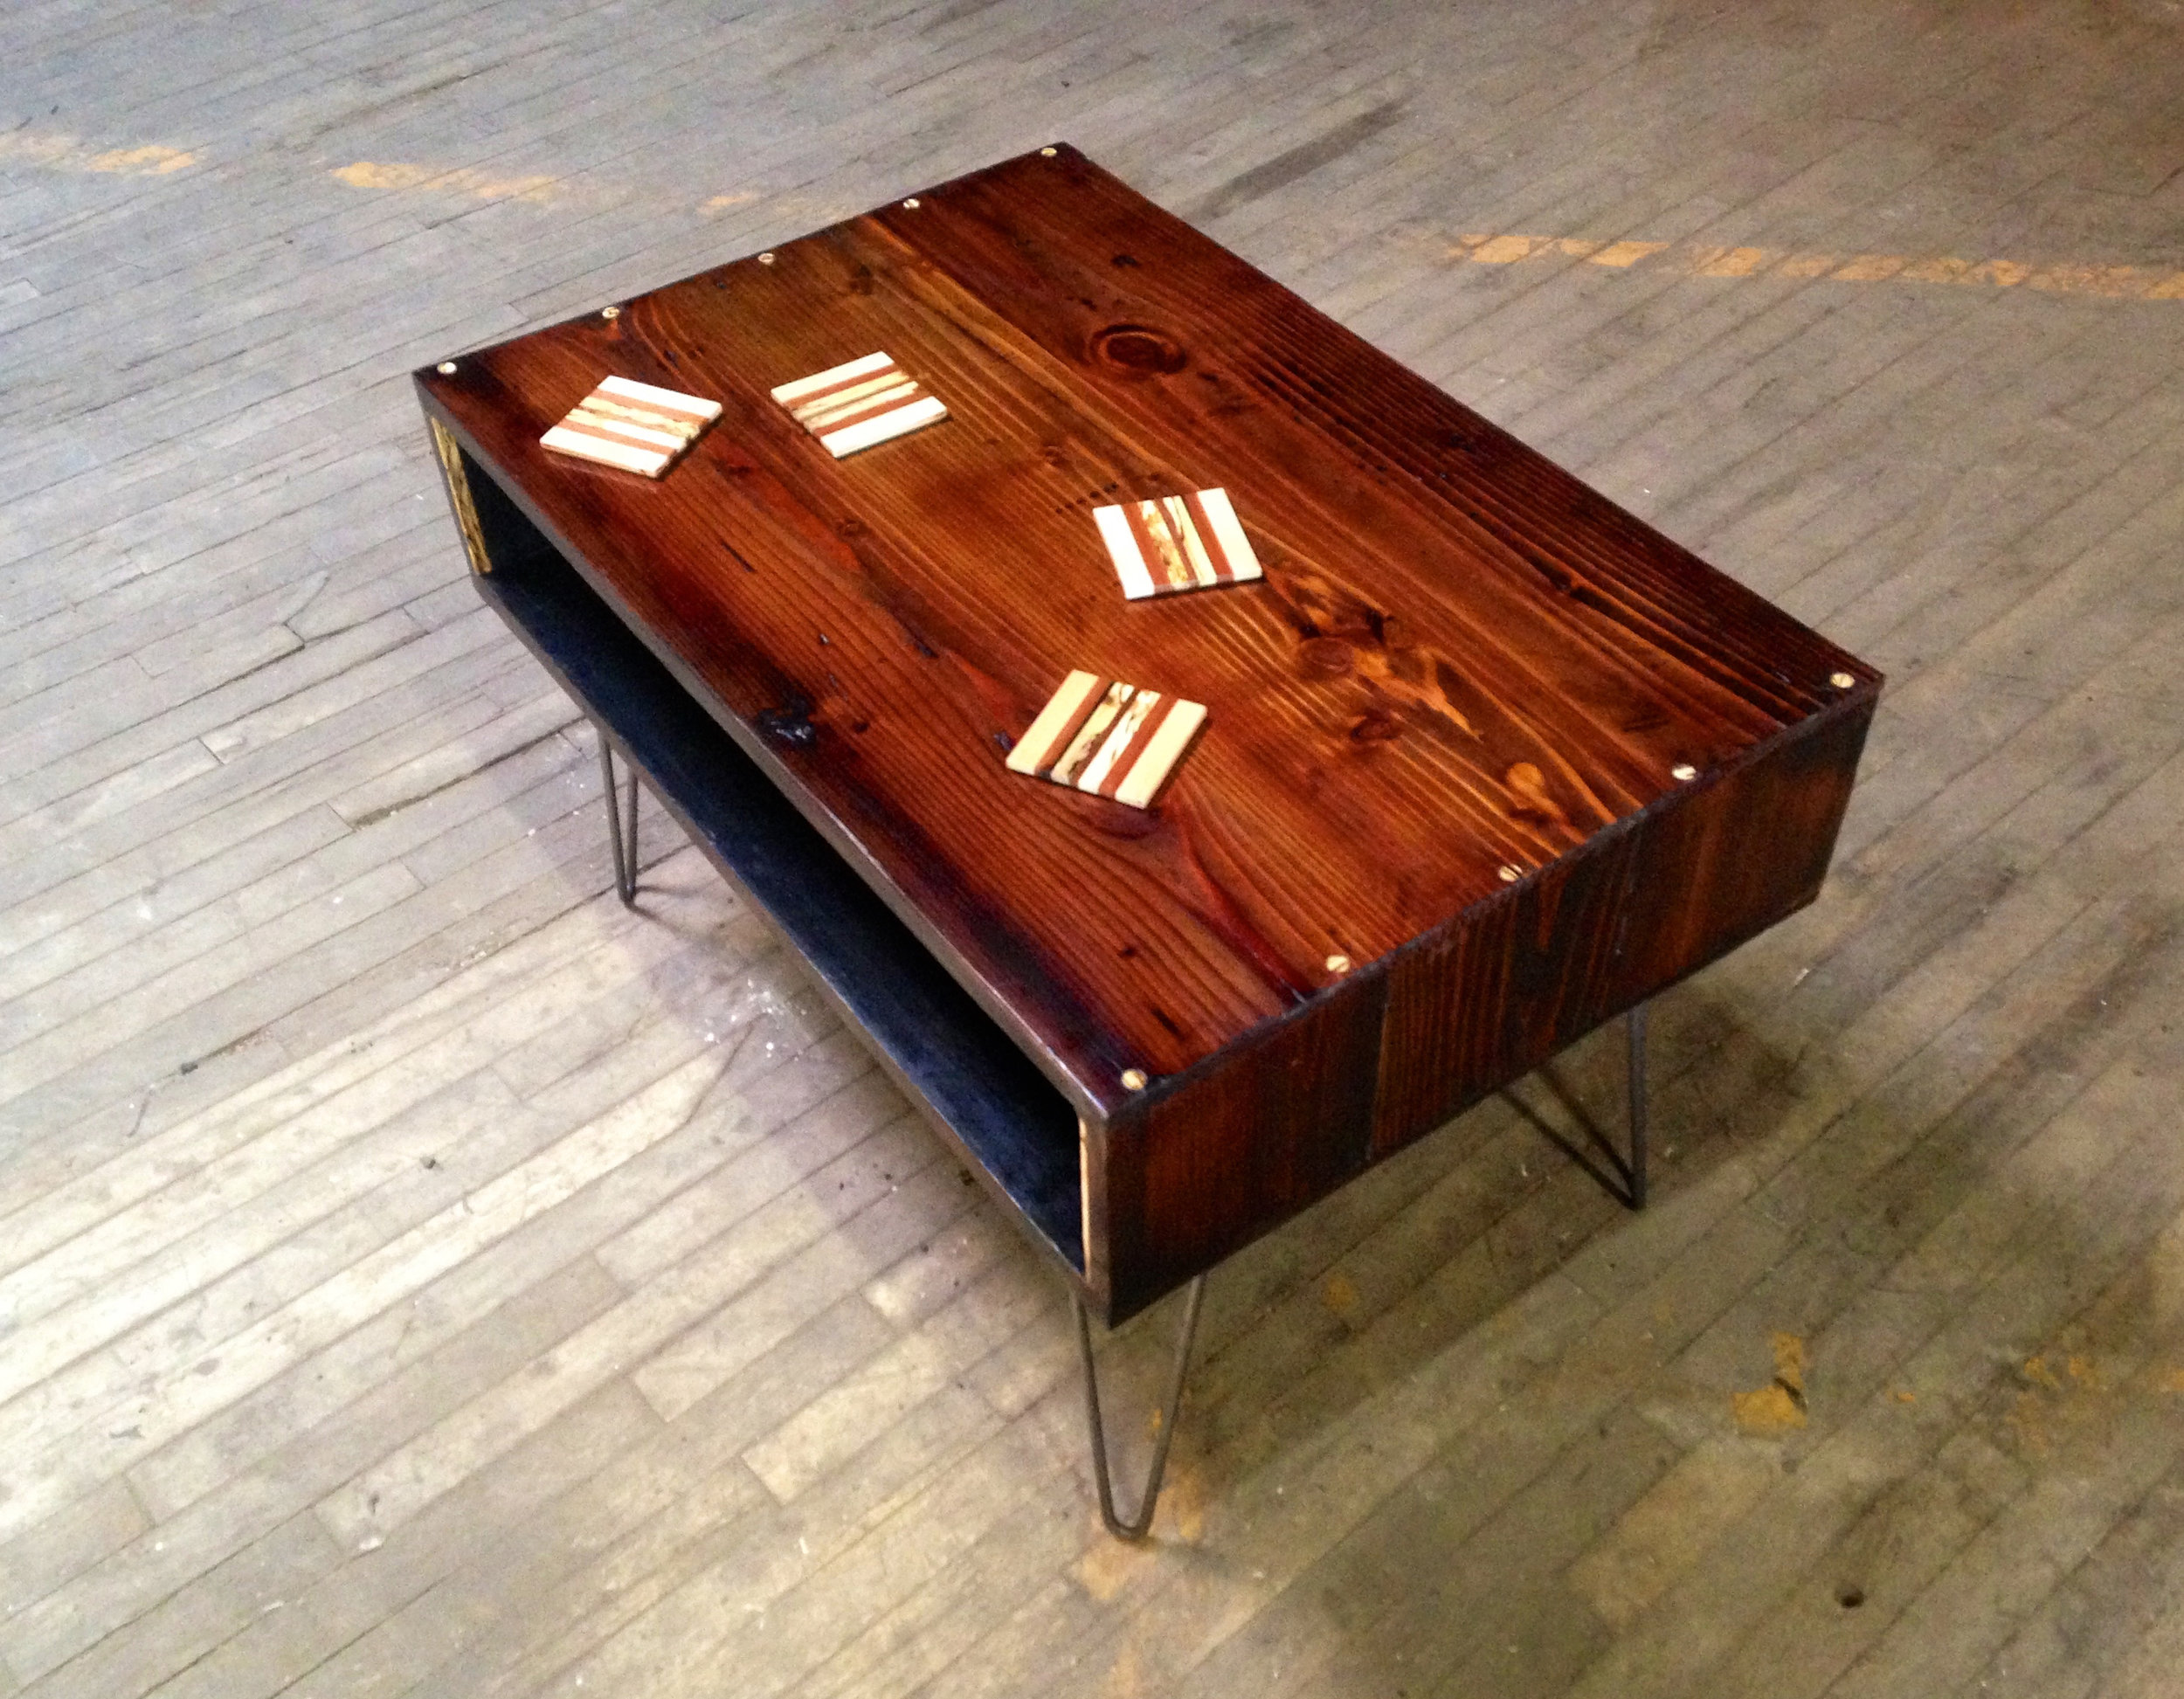 """Wrimer"" Custom Coffee Table -  2 x 3' x 21"" - Reclaimed Hemlock, Spalted Sycamore, Steel"